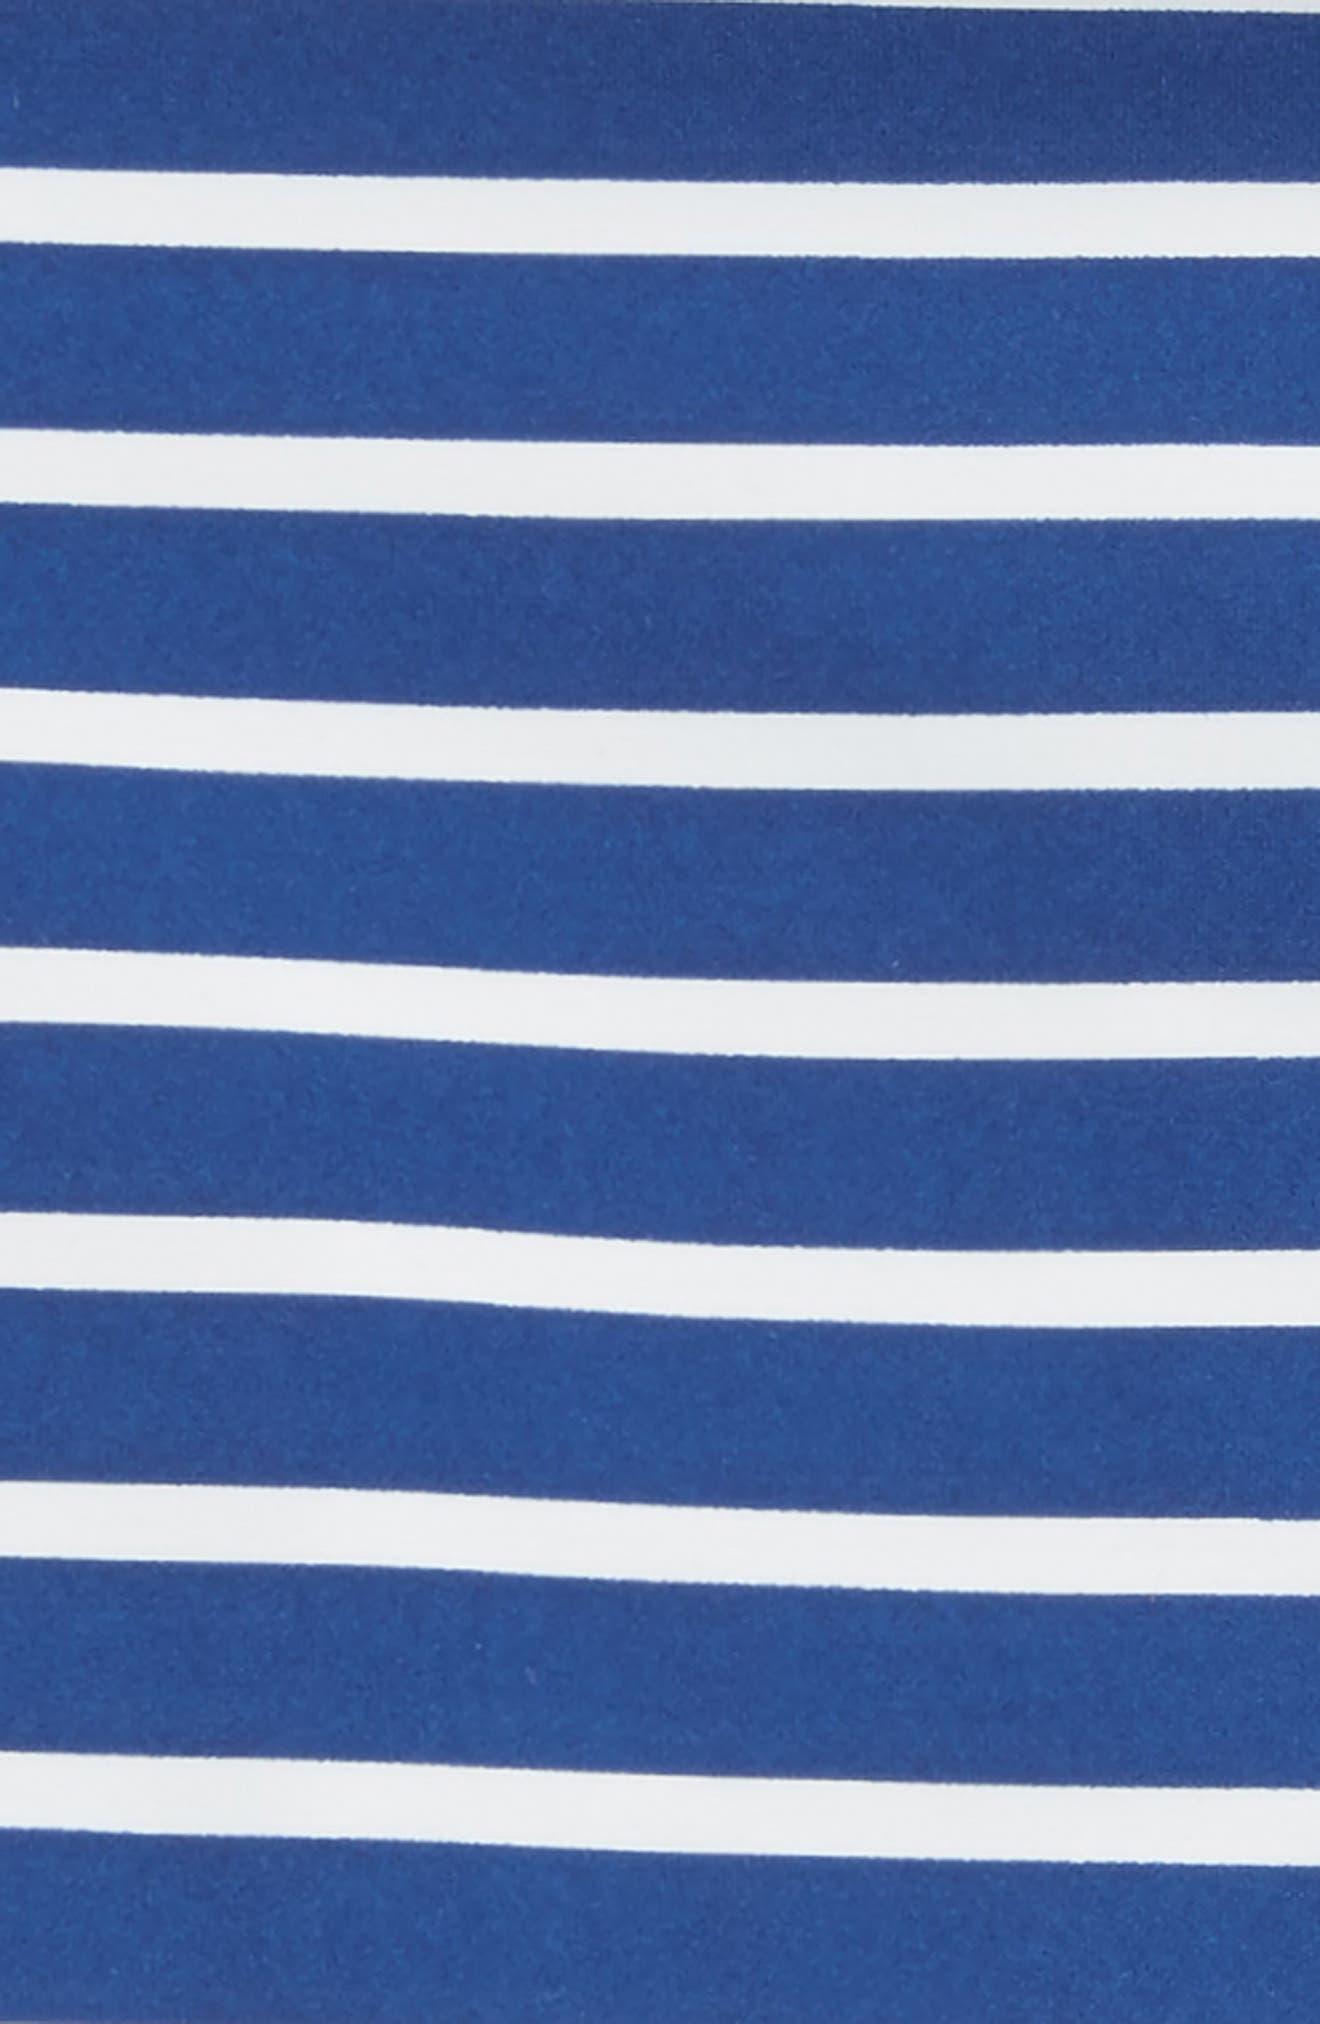 Two-Piece Rashguard Swimsuit,                             Alternate thumbnail 2, color,                             Astro Green/ Deep Sea